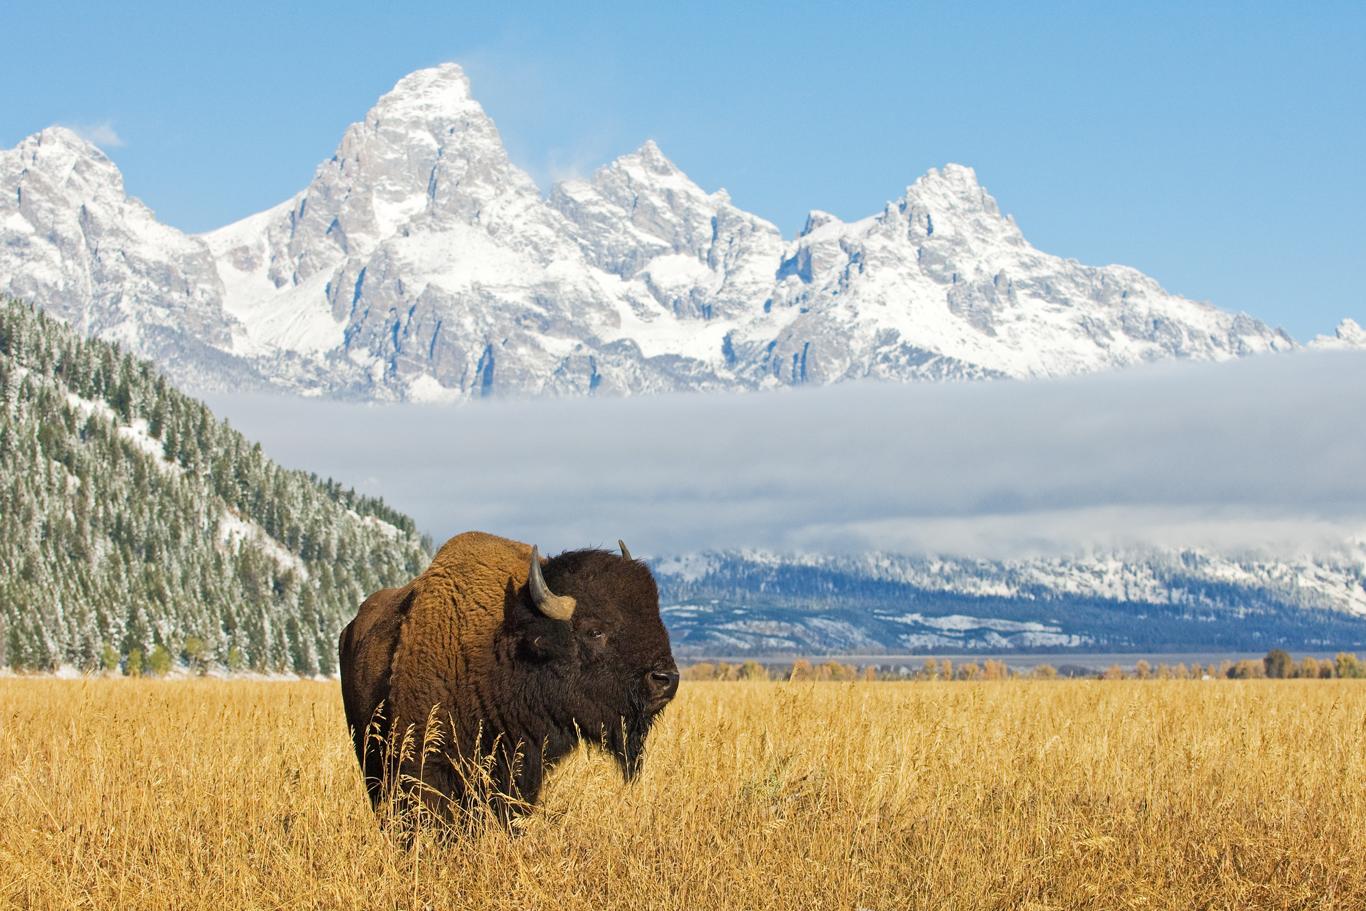 Bison-Wildlife-1366-0920